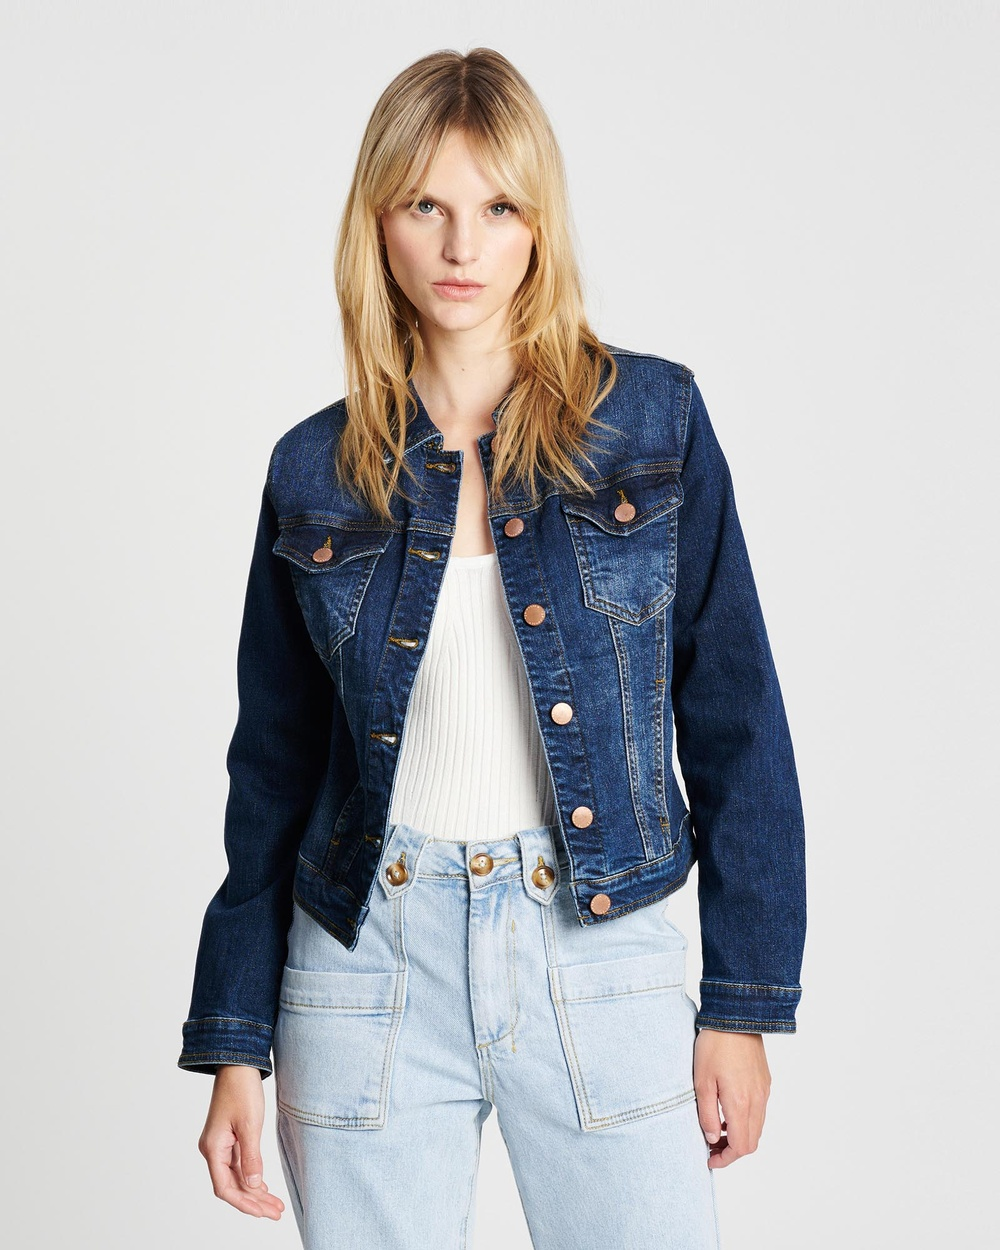 DRICOPER DENIM Dita Classic Denim Jacket jacket Classic Wash Australia